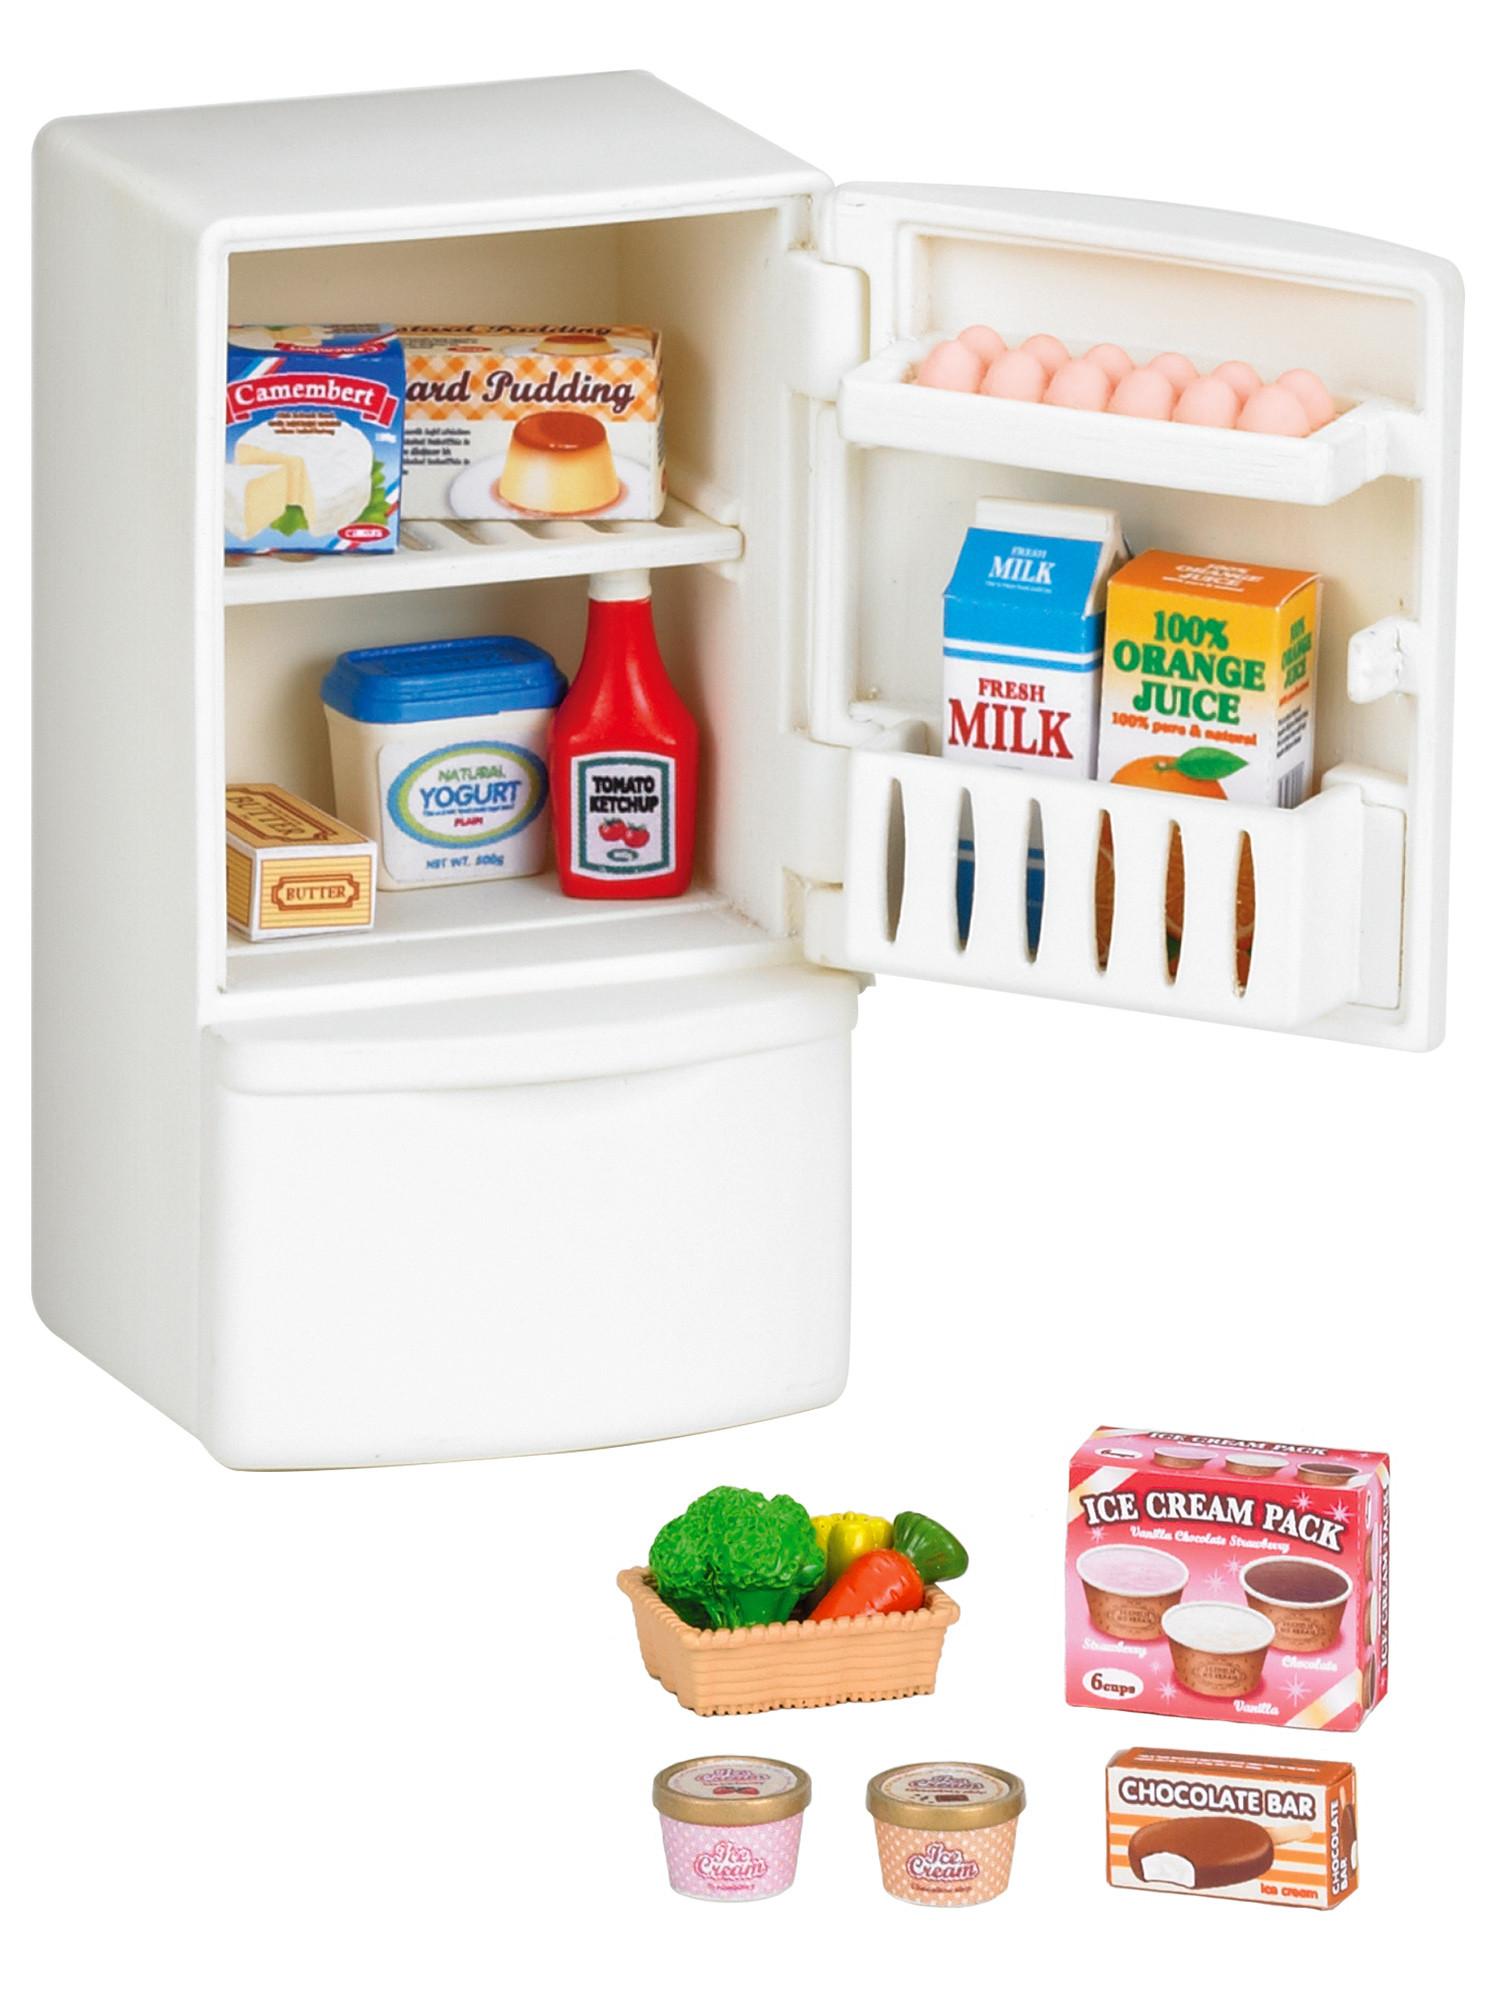 Sylvanian Families SYLVANIAN FAMILIES Холодильник с продуктами набор холодильник с продуктами sylvanian families